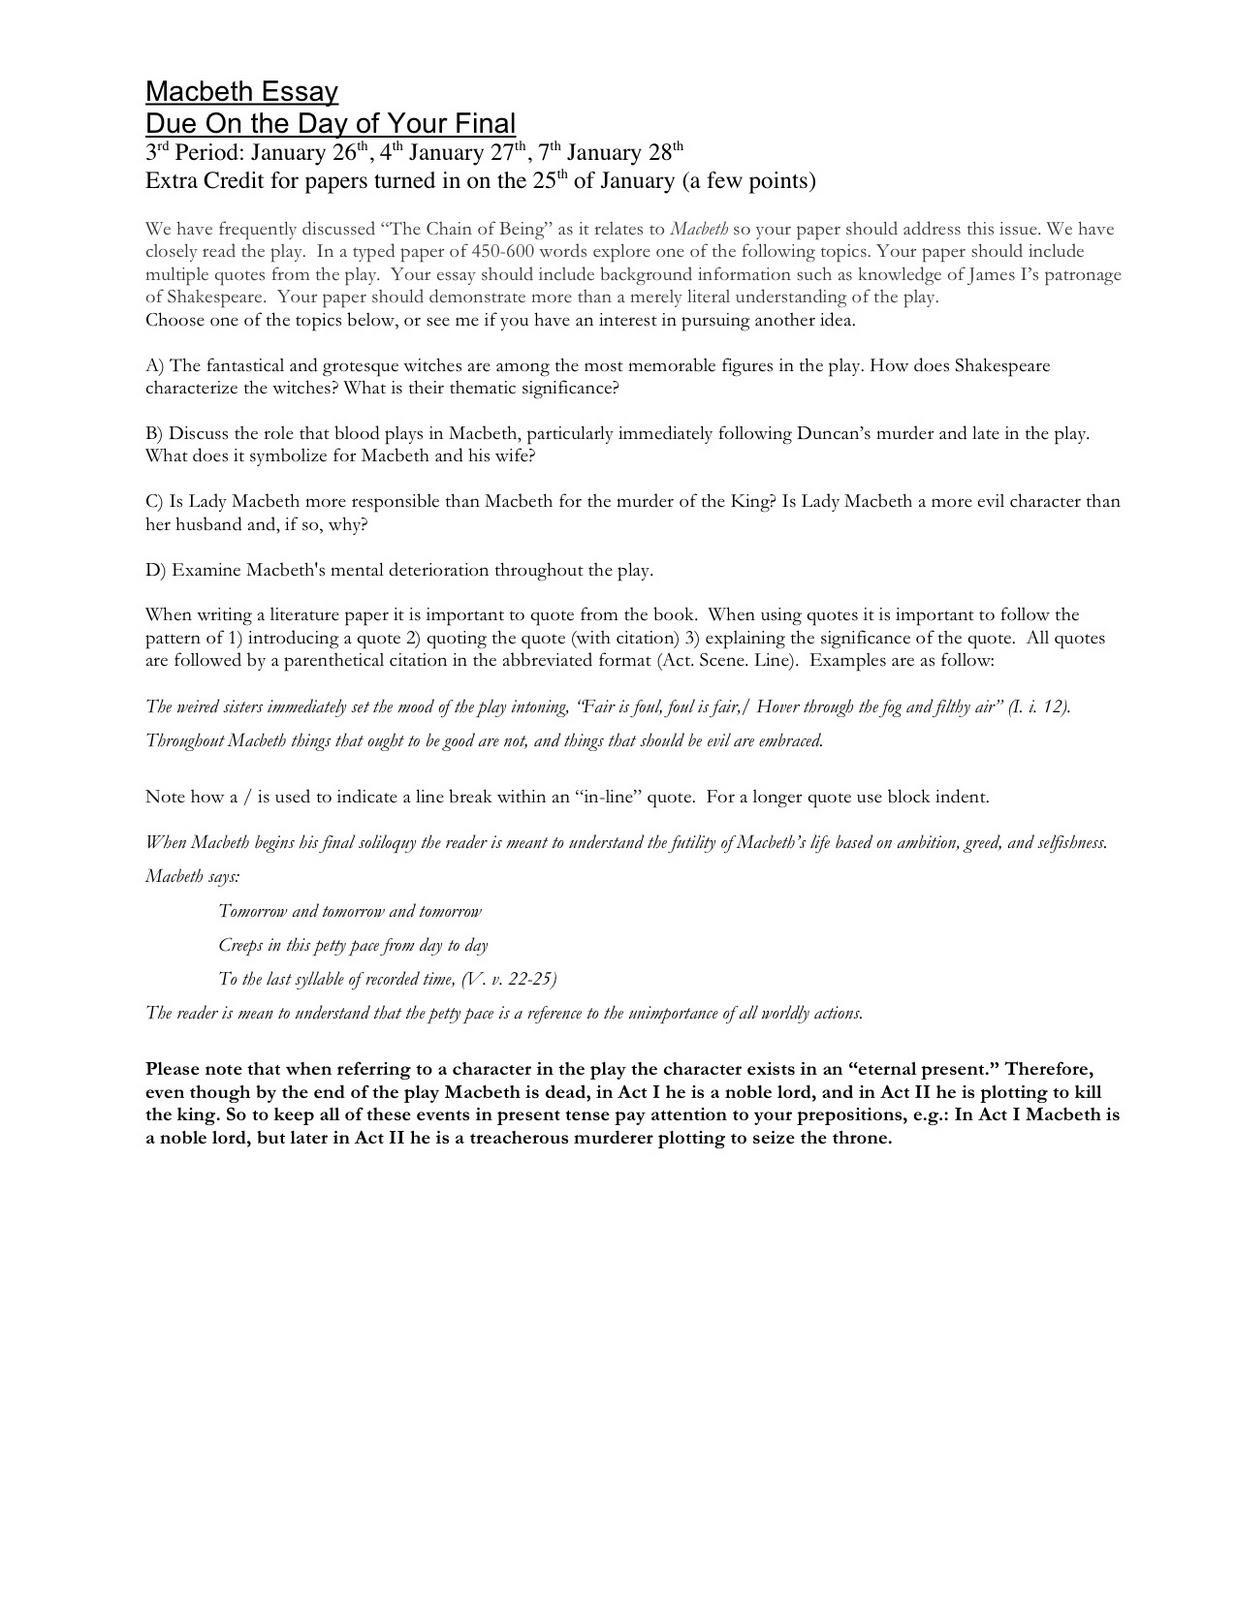 The Tragedy of MacBeth - Free Essay Example | blogger.com